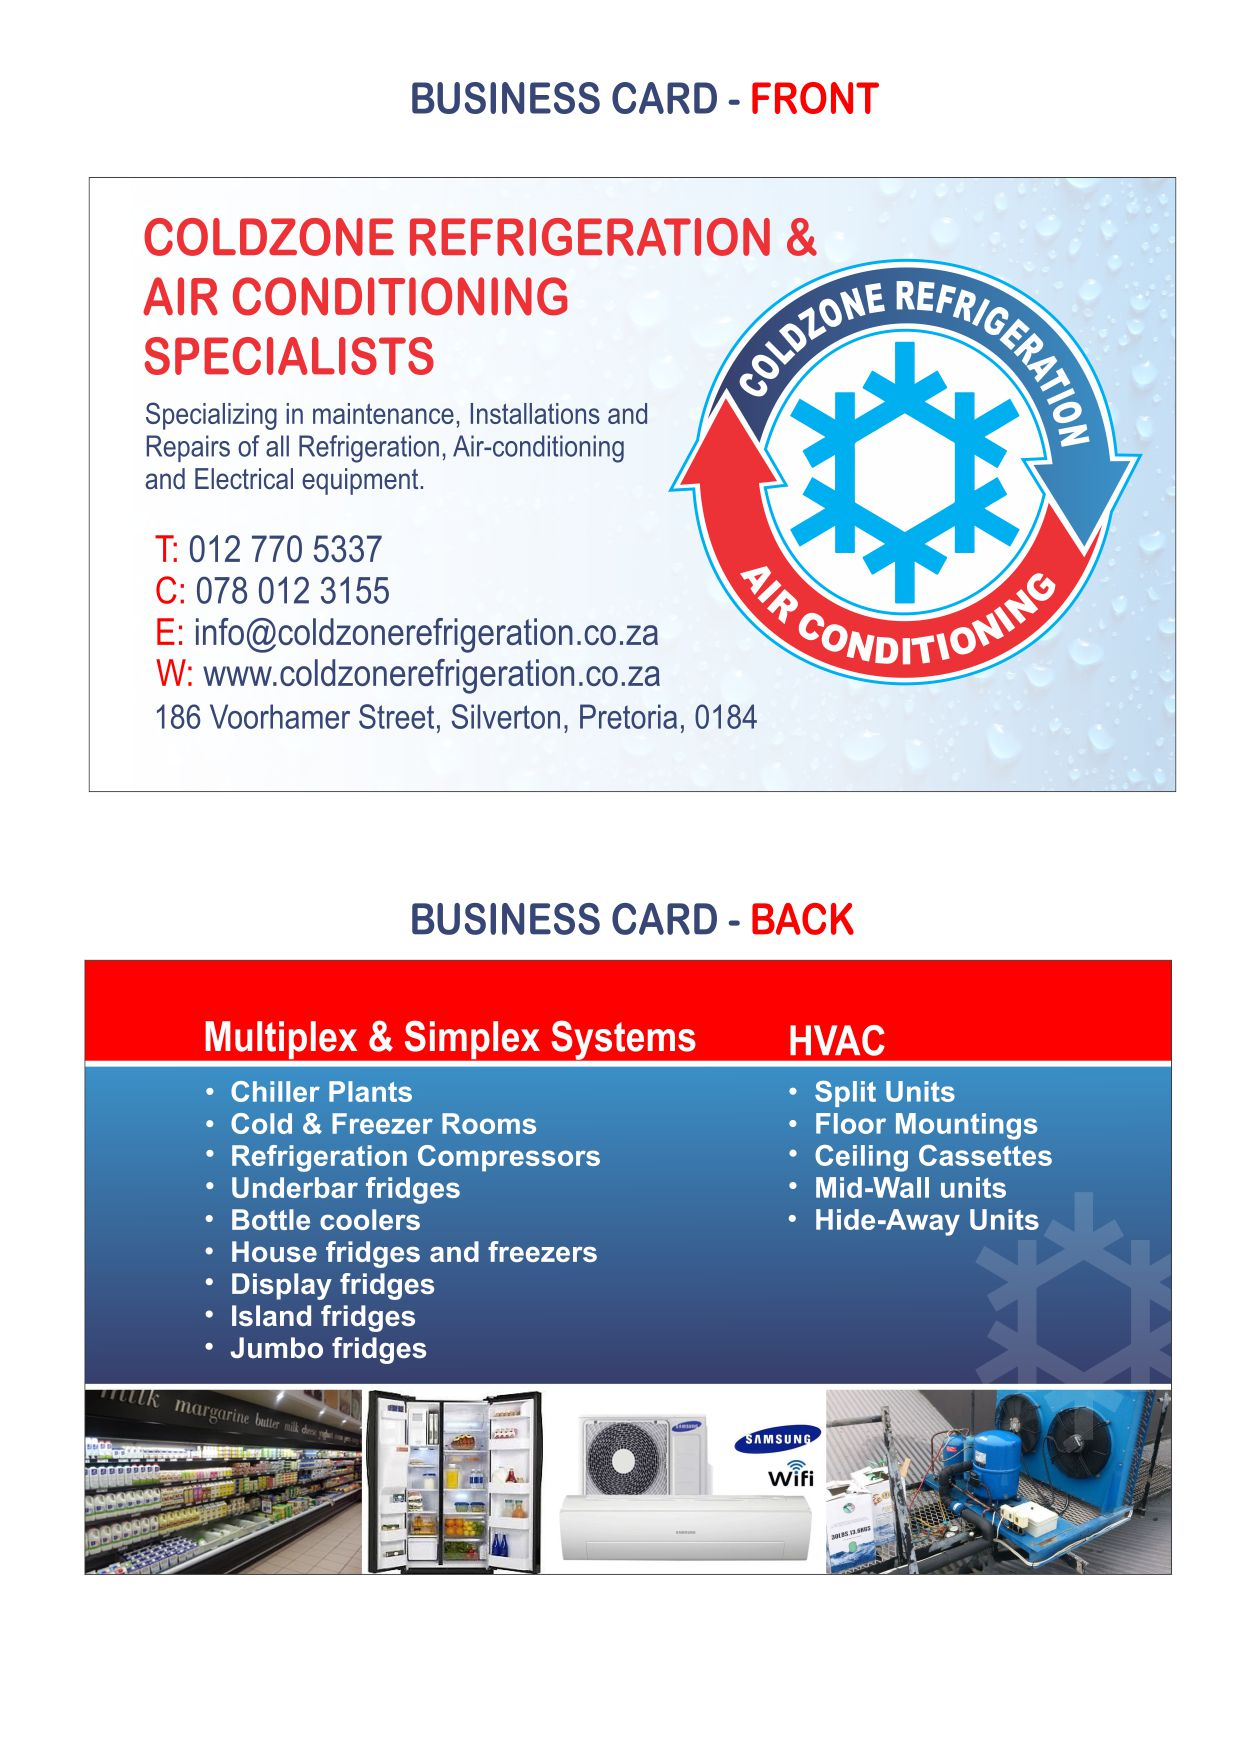 coldzone Refrigeration&Airconditioning Specialists 0127705337